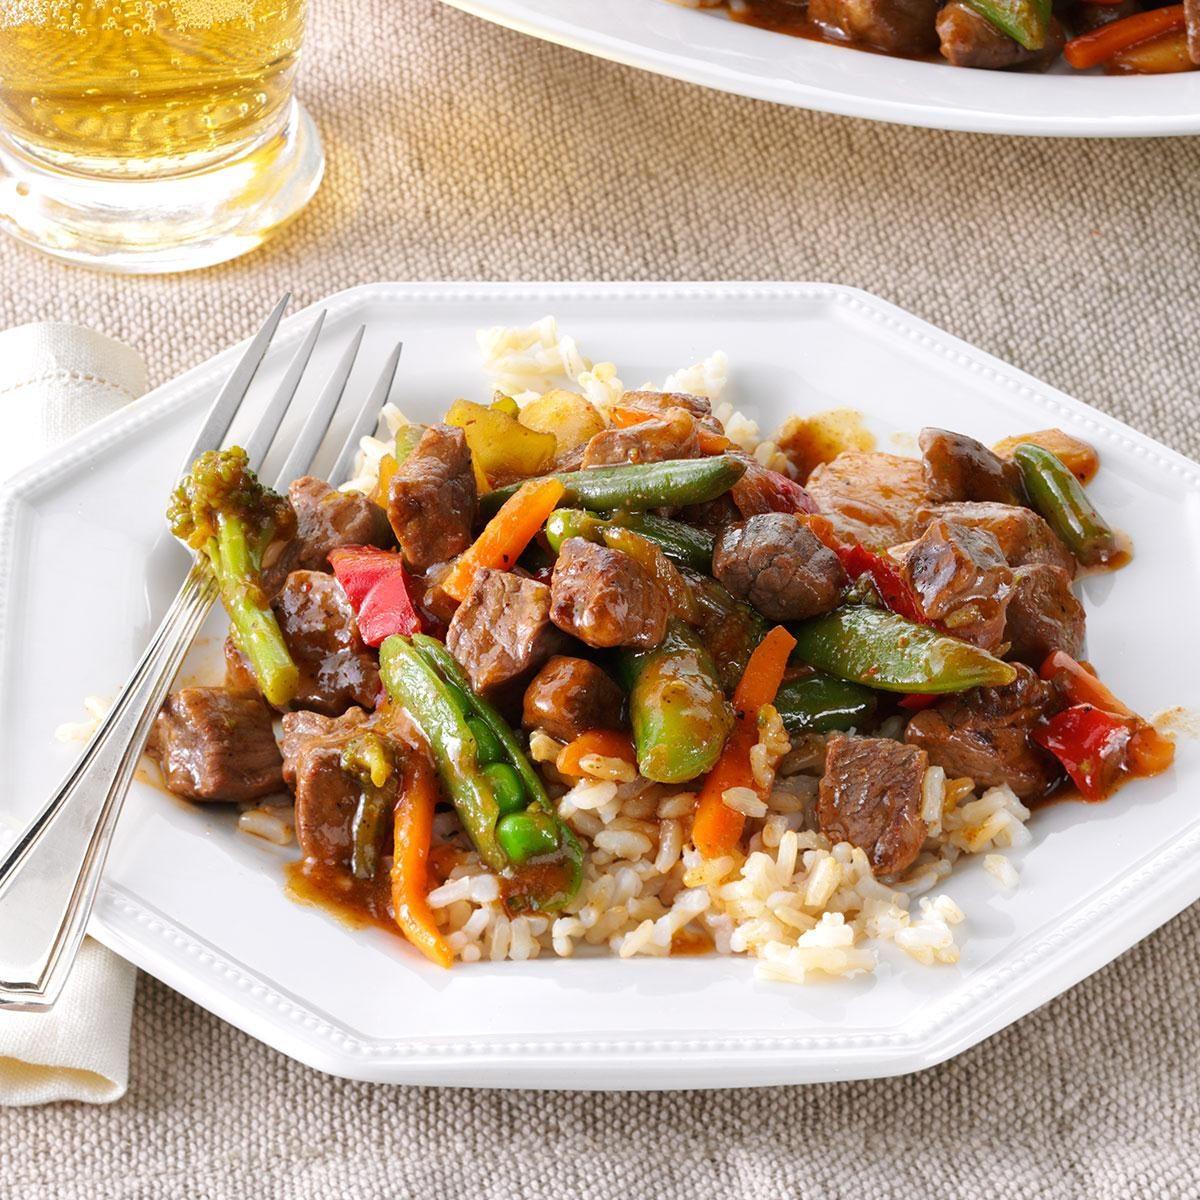 Stir Fried Steak Veggies Recipe